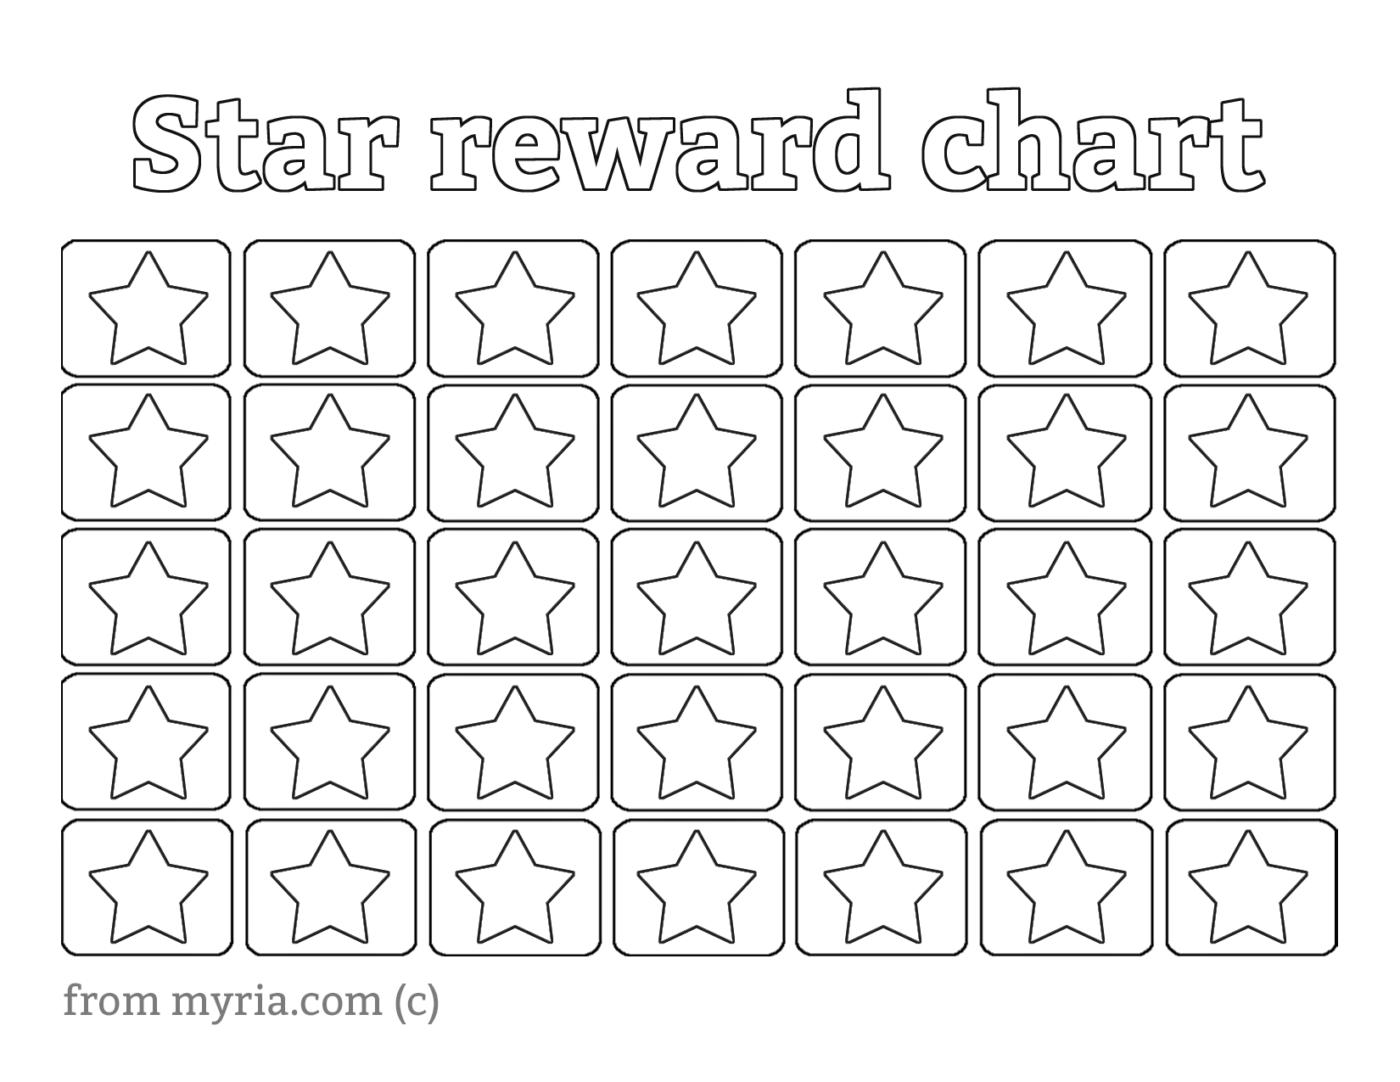 8 Free Printable Reward Charts Fill In The Stars Printables Freeprintables Rewardcharts Reward In 2020 Printable Reward Charts Star Chart For Kids Sticker Chart